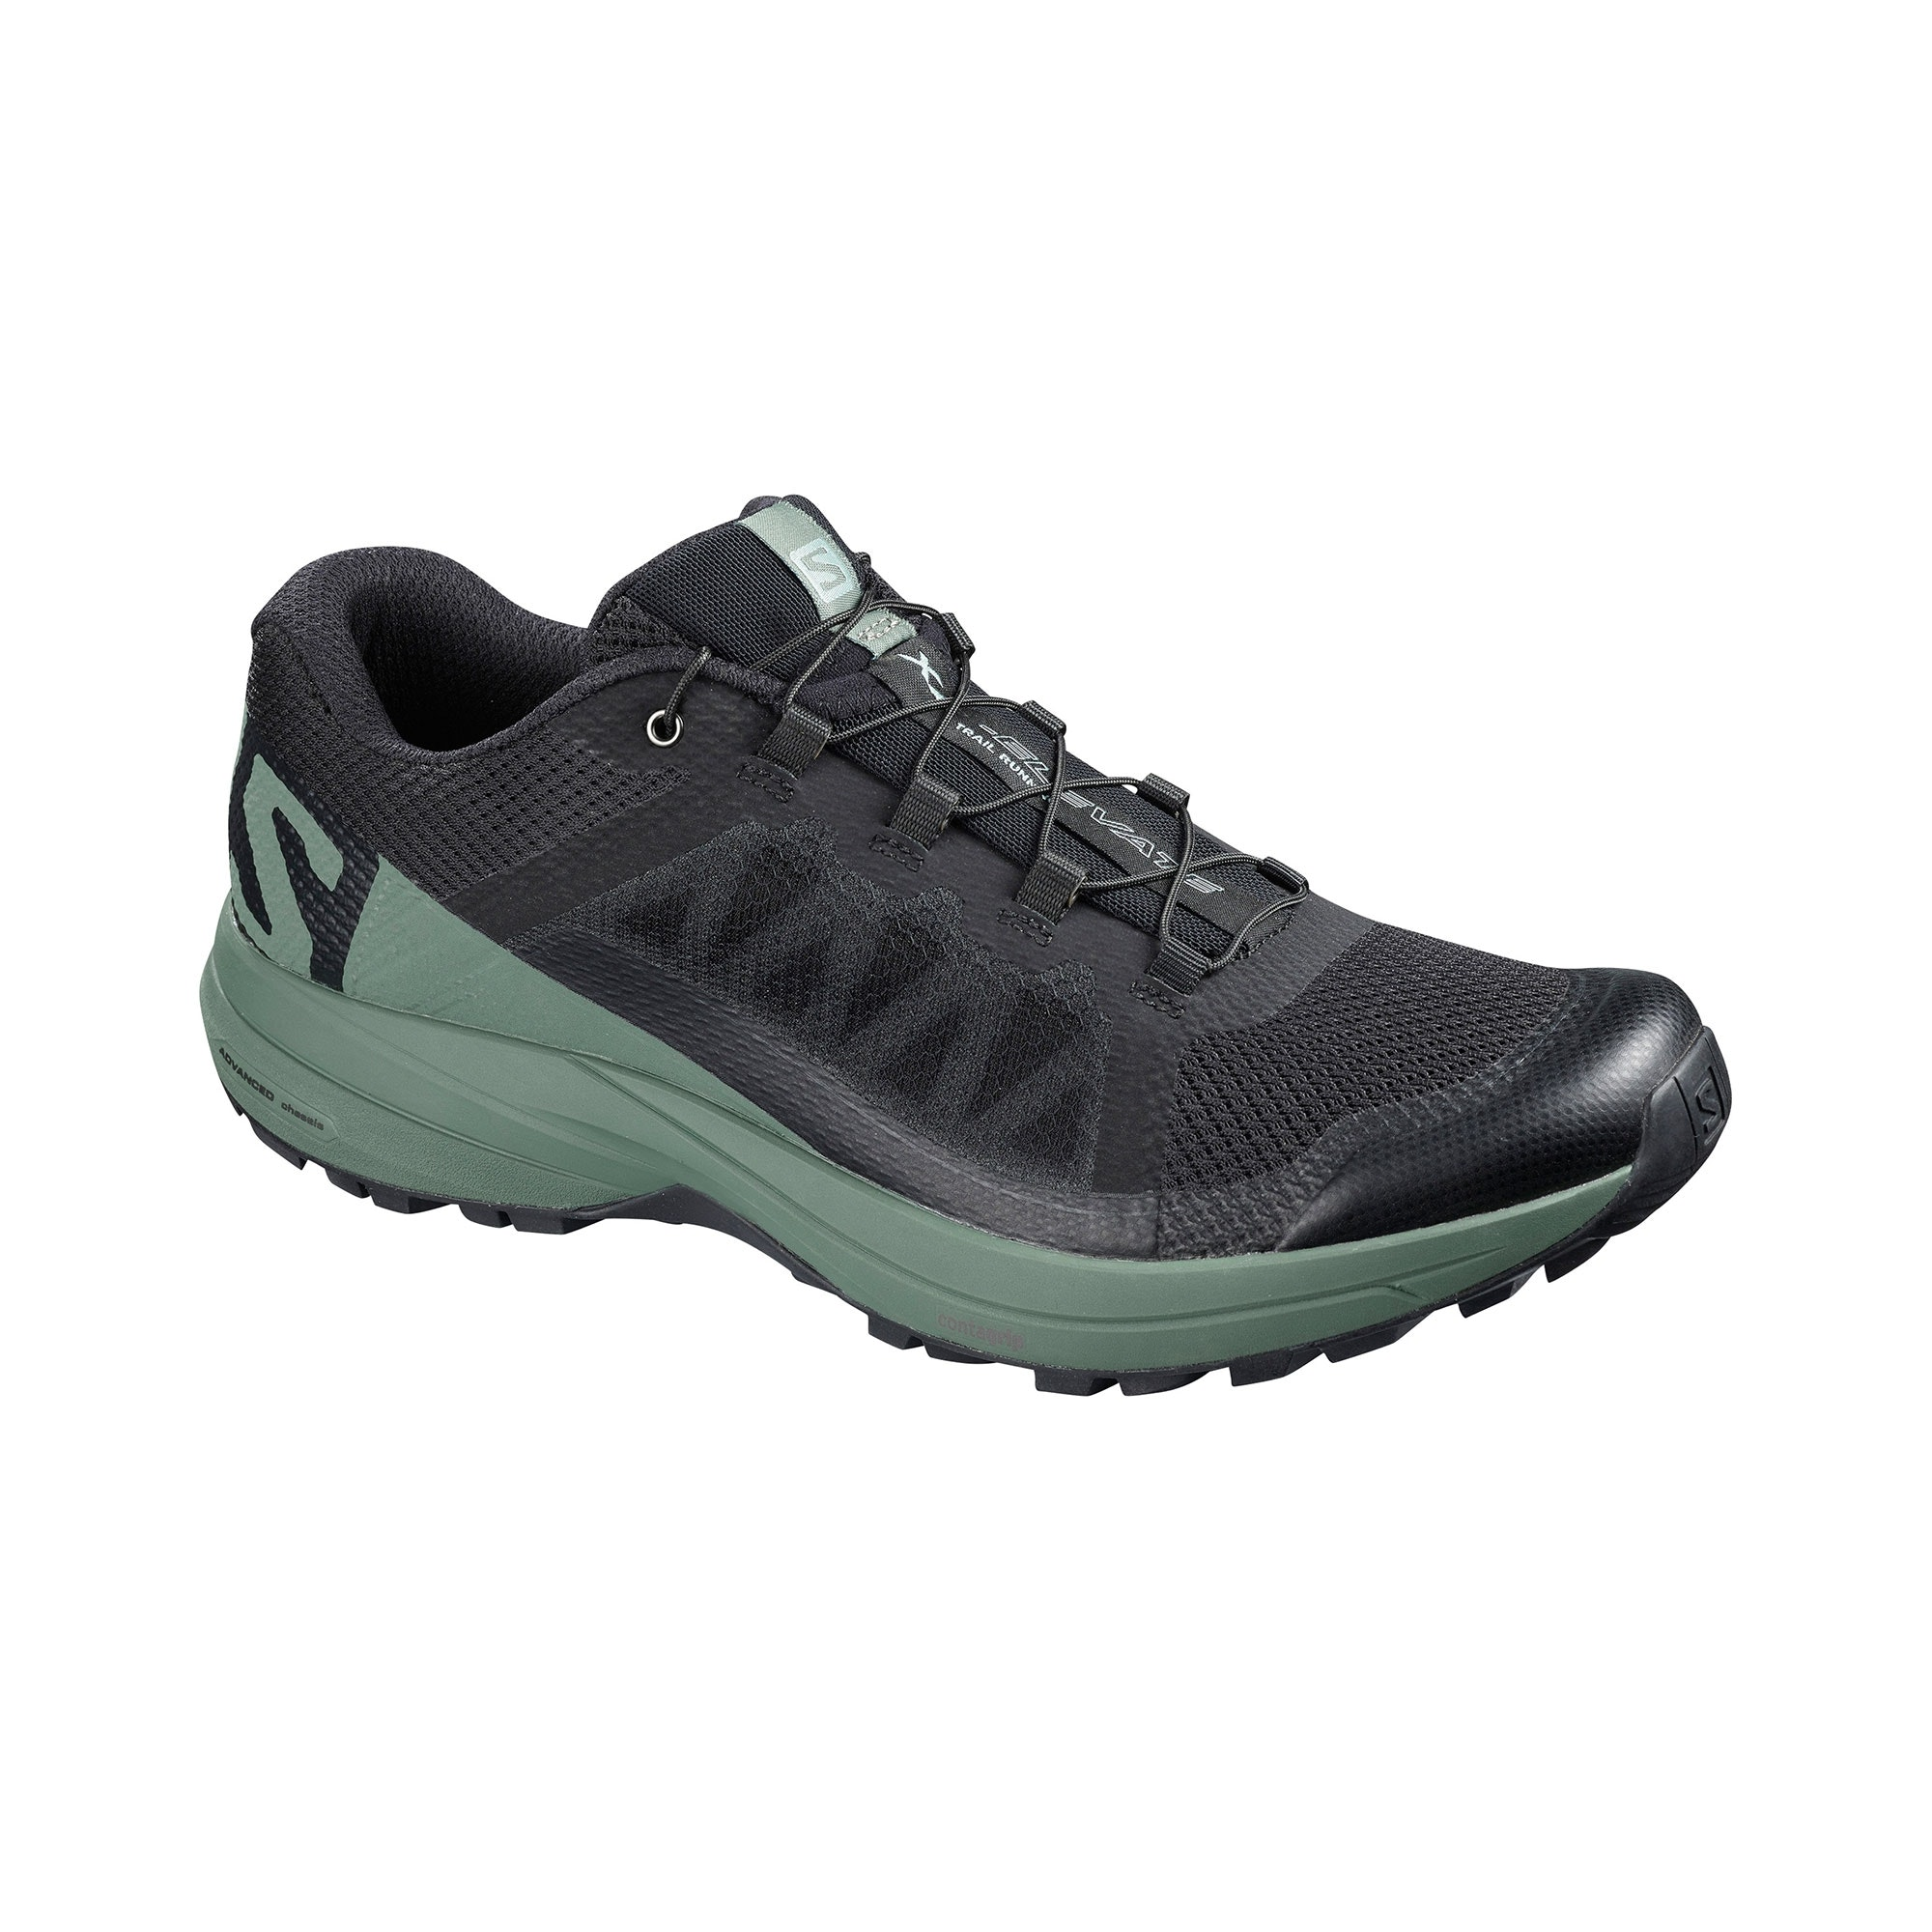 ShoesBootsHikingamp; Footwear Salomon Running Sale Au 8wOnP0k